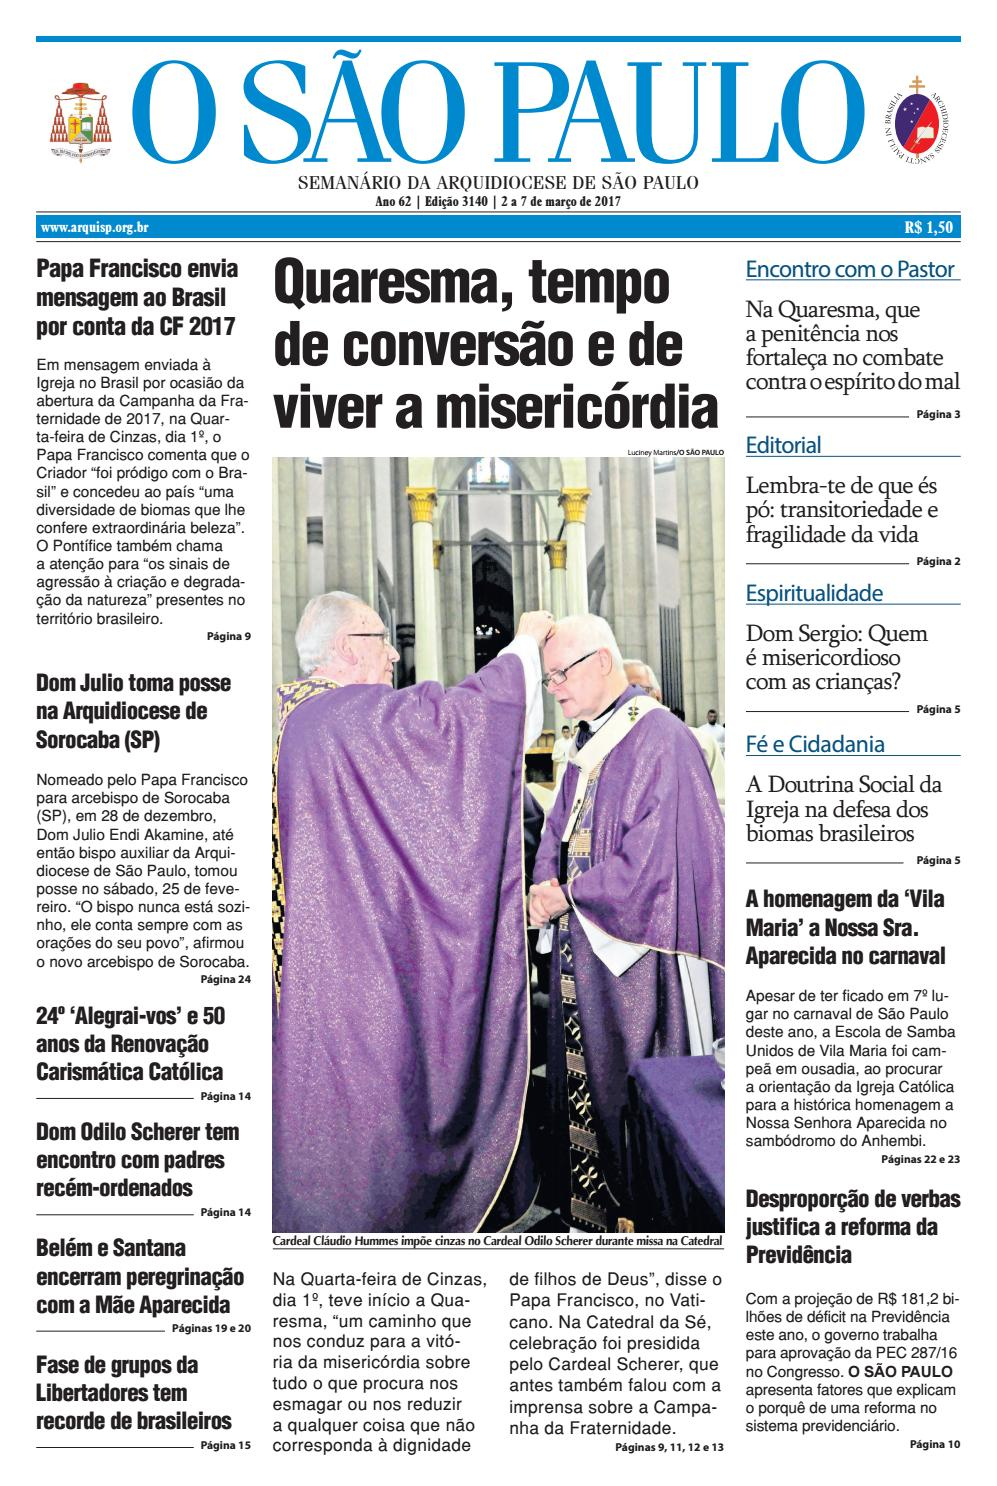 O SÃO PAULO - 3140 by jornal O SAO PAULO - issuu bdf8ff1e4d8